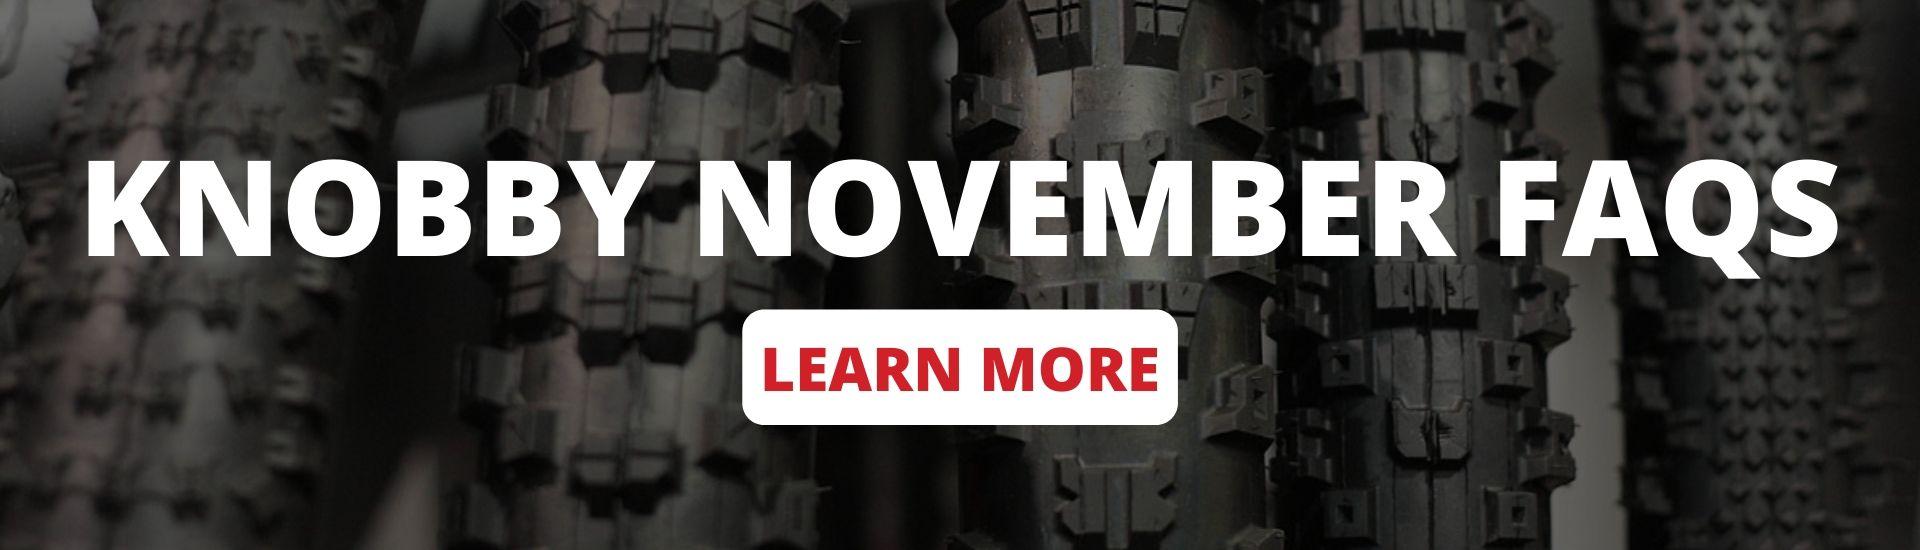 Knobby November